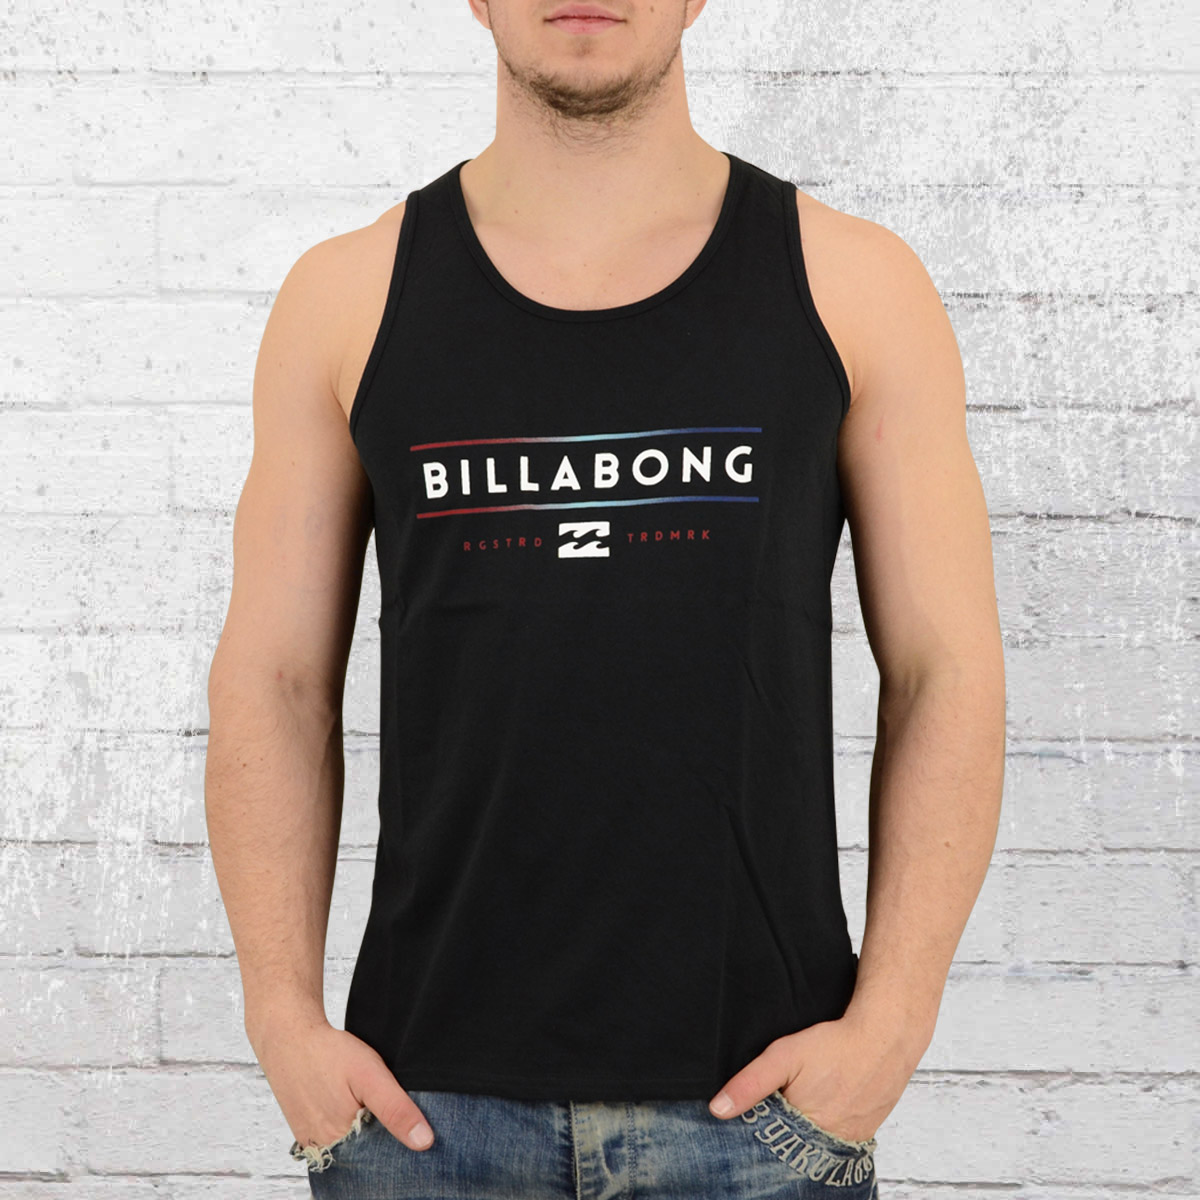 4beb2146ab444 Billabong Mens Singlet Unity Tank Top black. ›‹ «